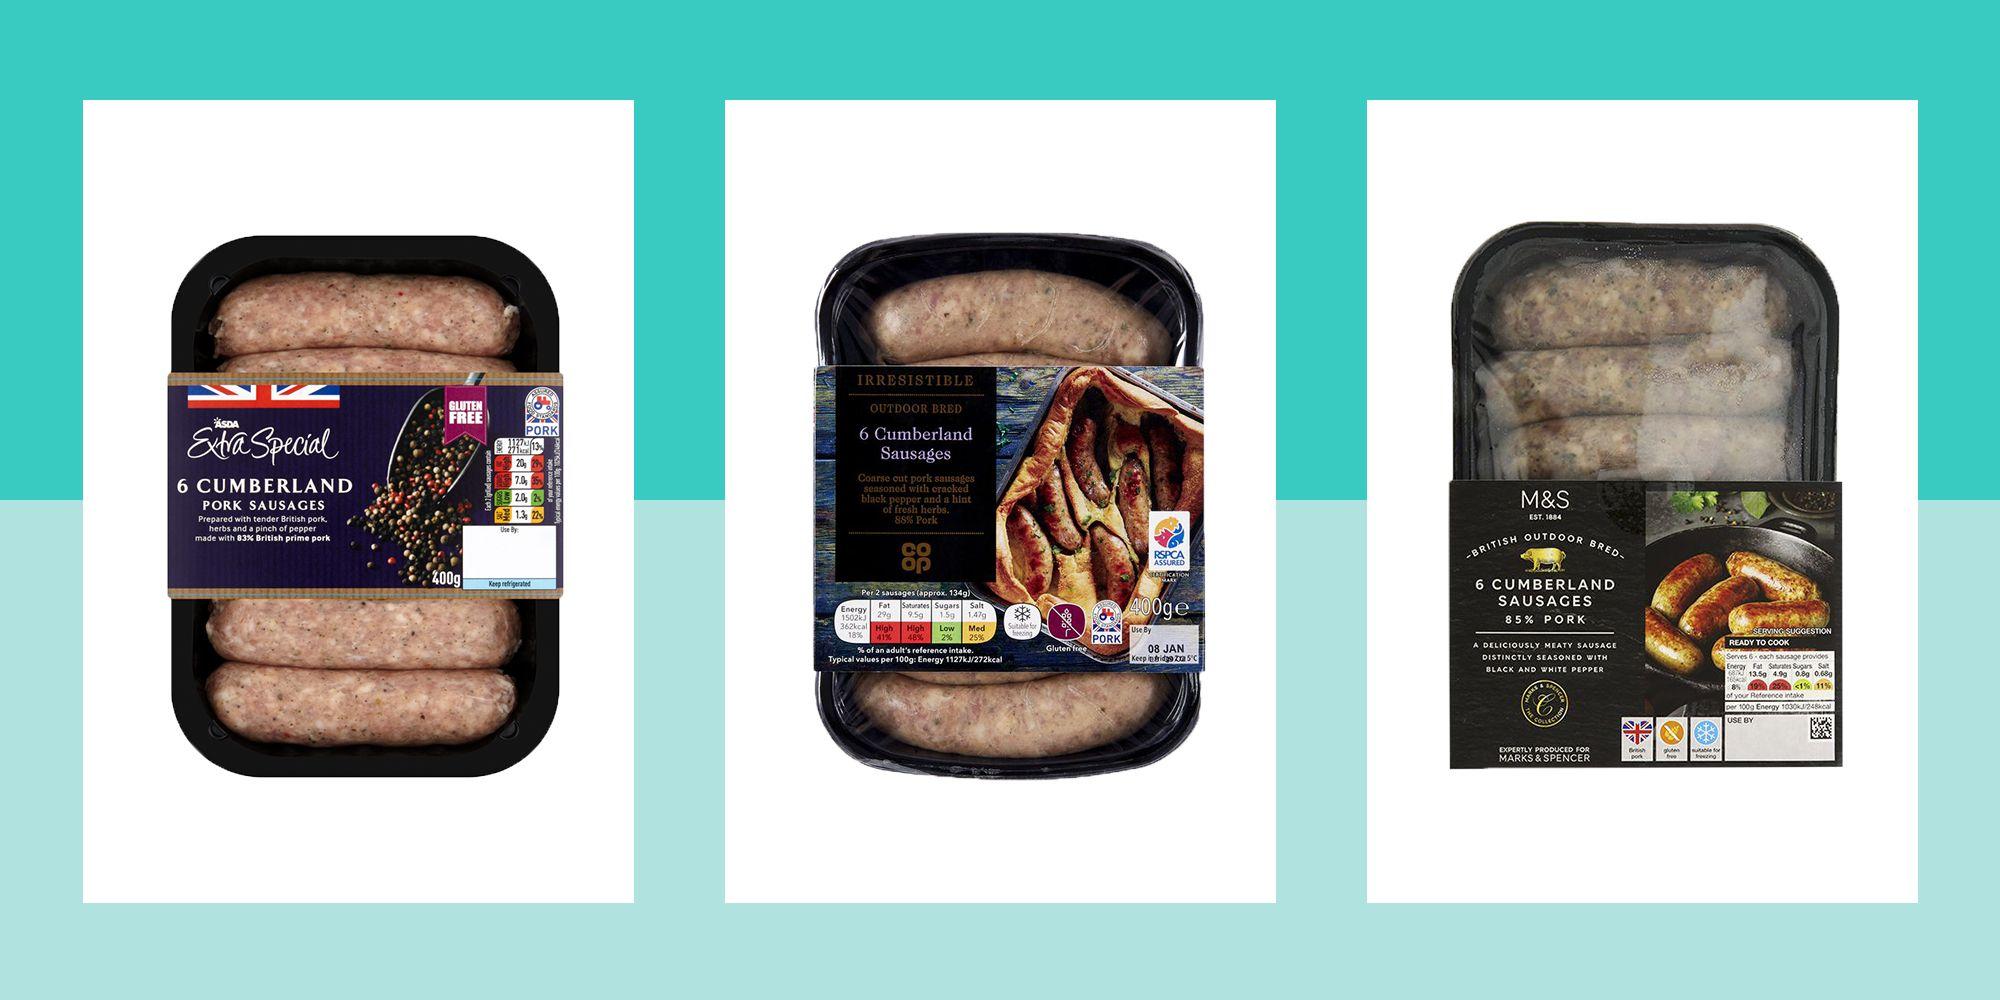 We found the best Cumberland sausage in our taste test